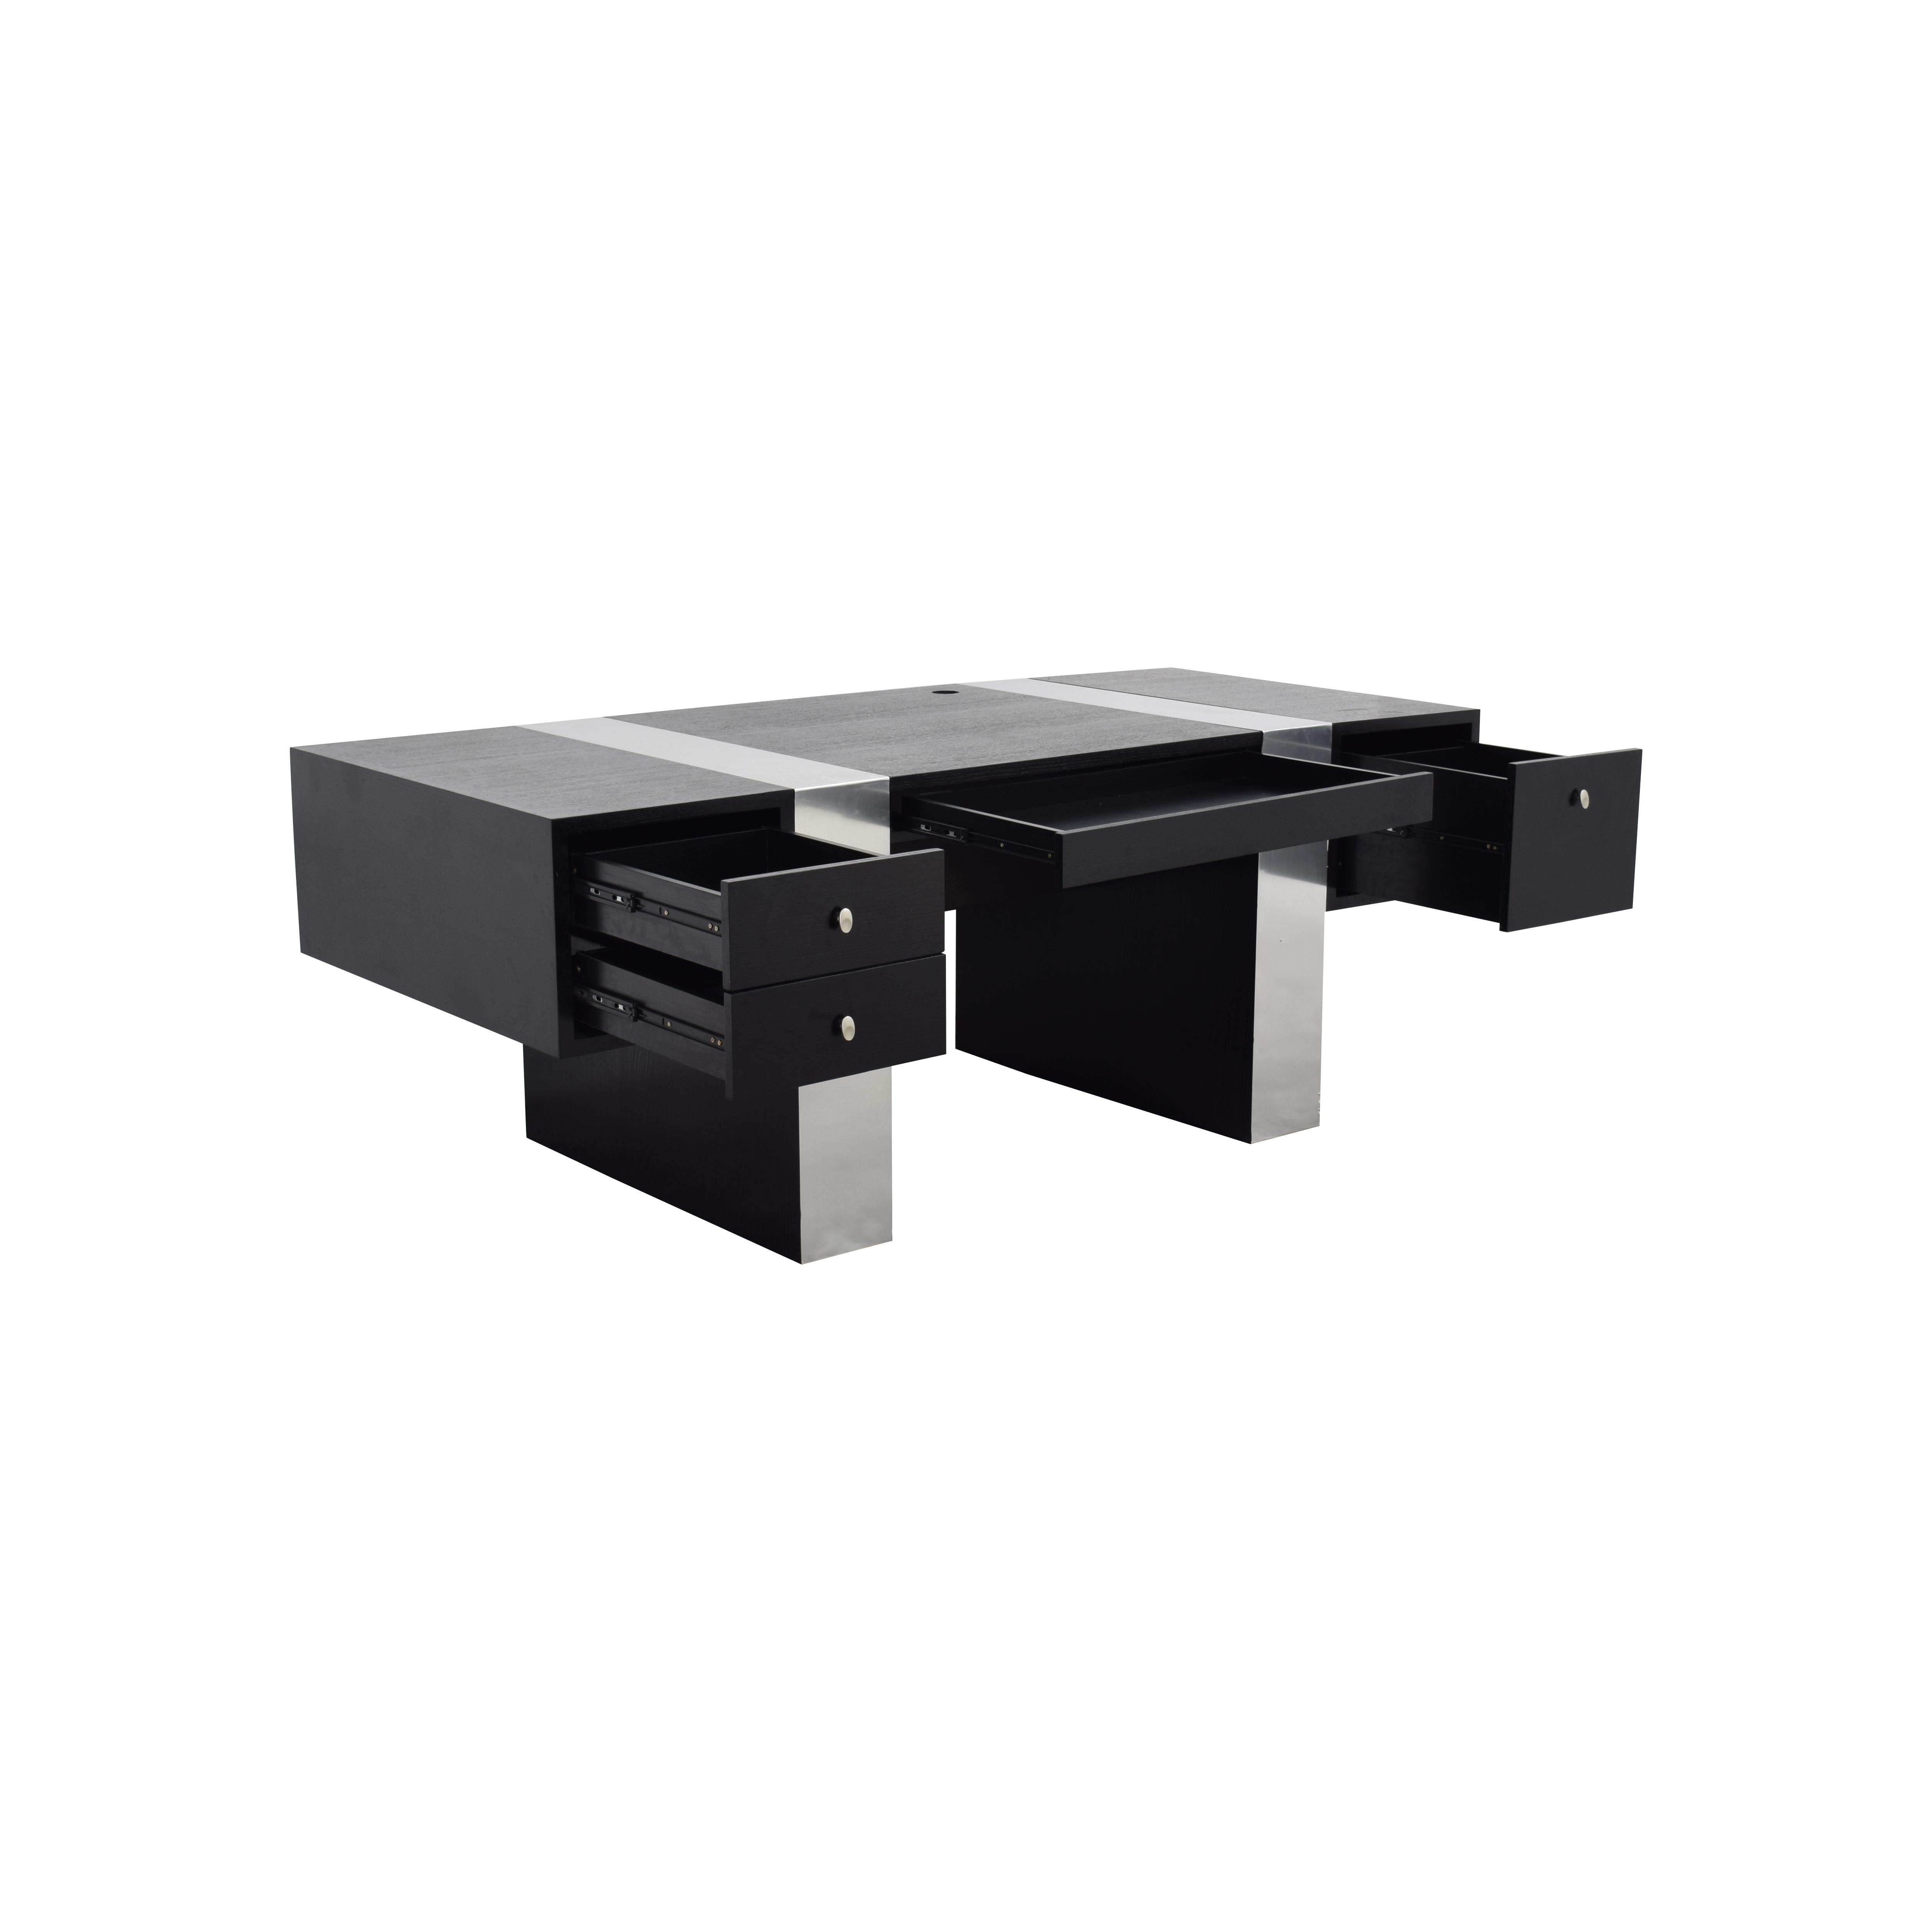 InMod InMod Nero Black and Chrome Desk for sale